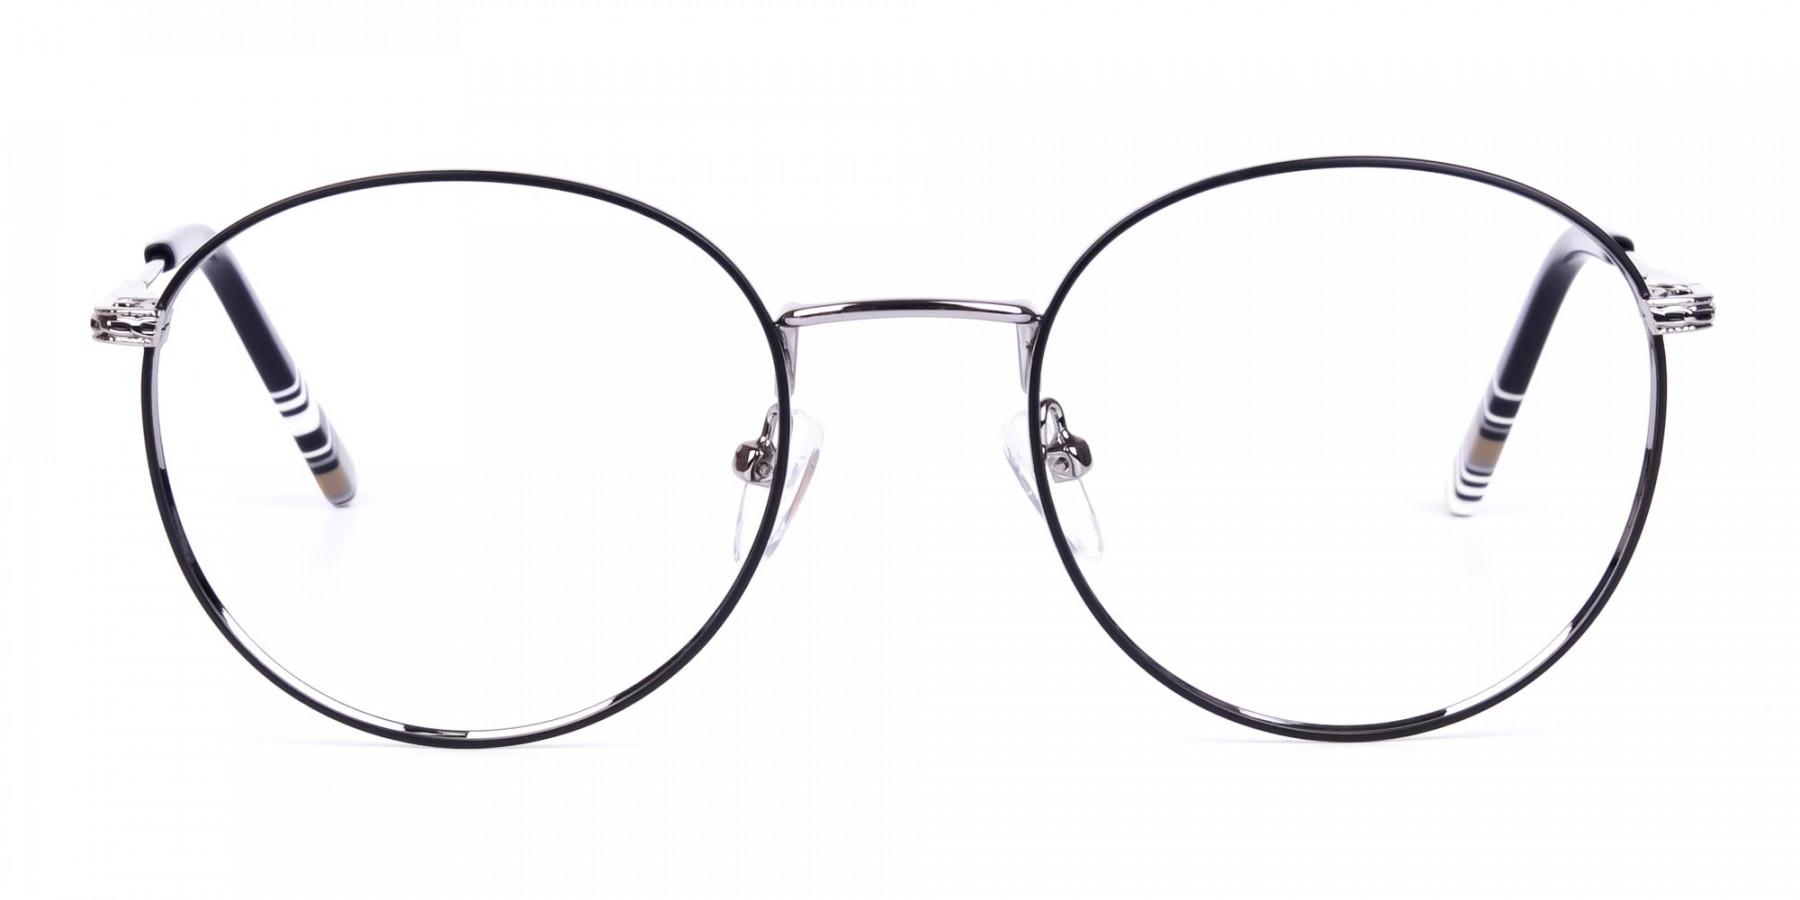 Black-Silver-Round-Full-Rim-Glasses-1